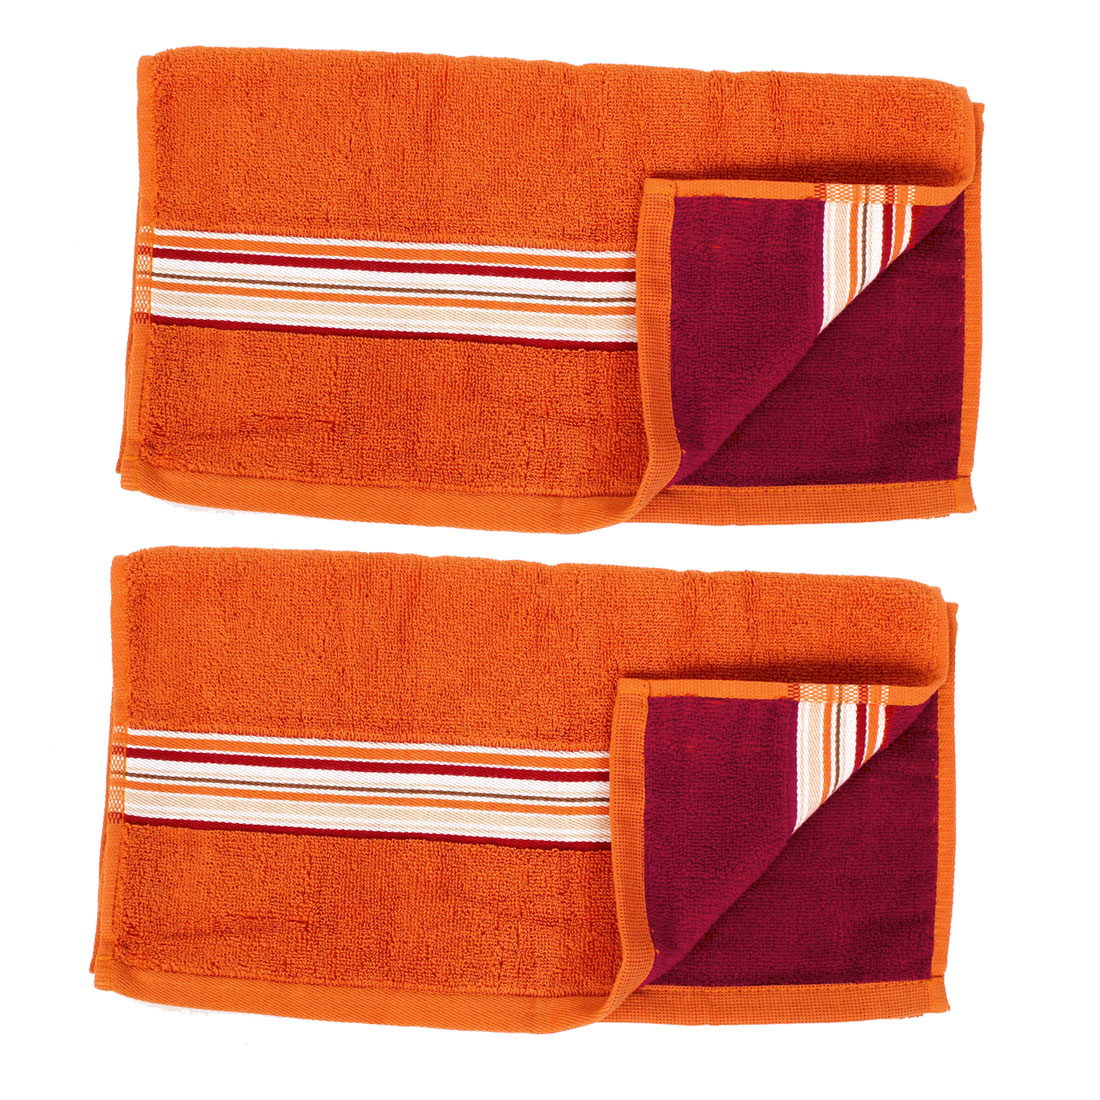 Absorbent Drying Beach Bath Shower Towel Washcloth Orange 34 x 75cm 2pcs